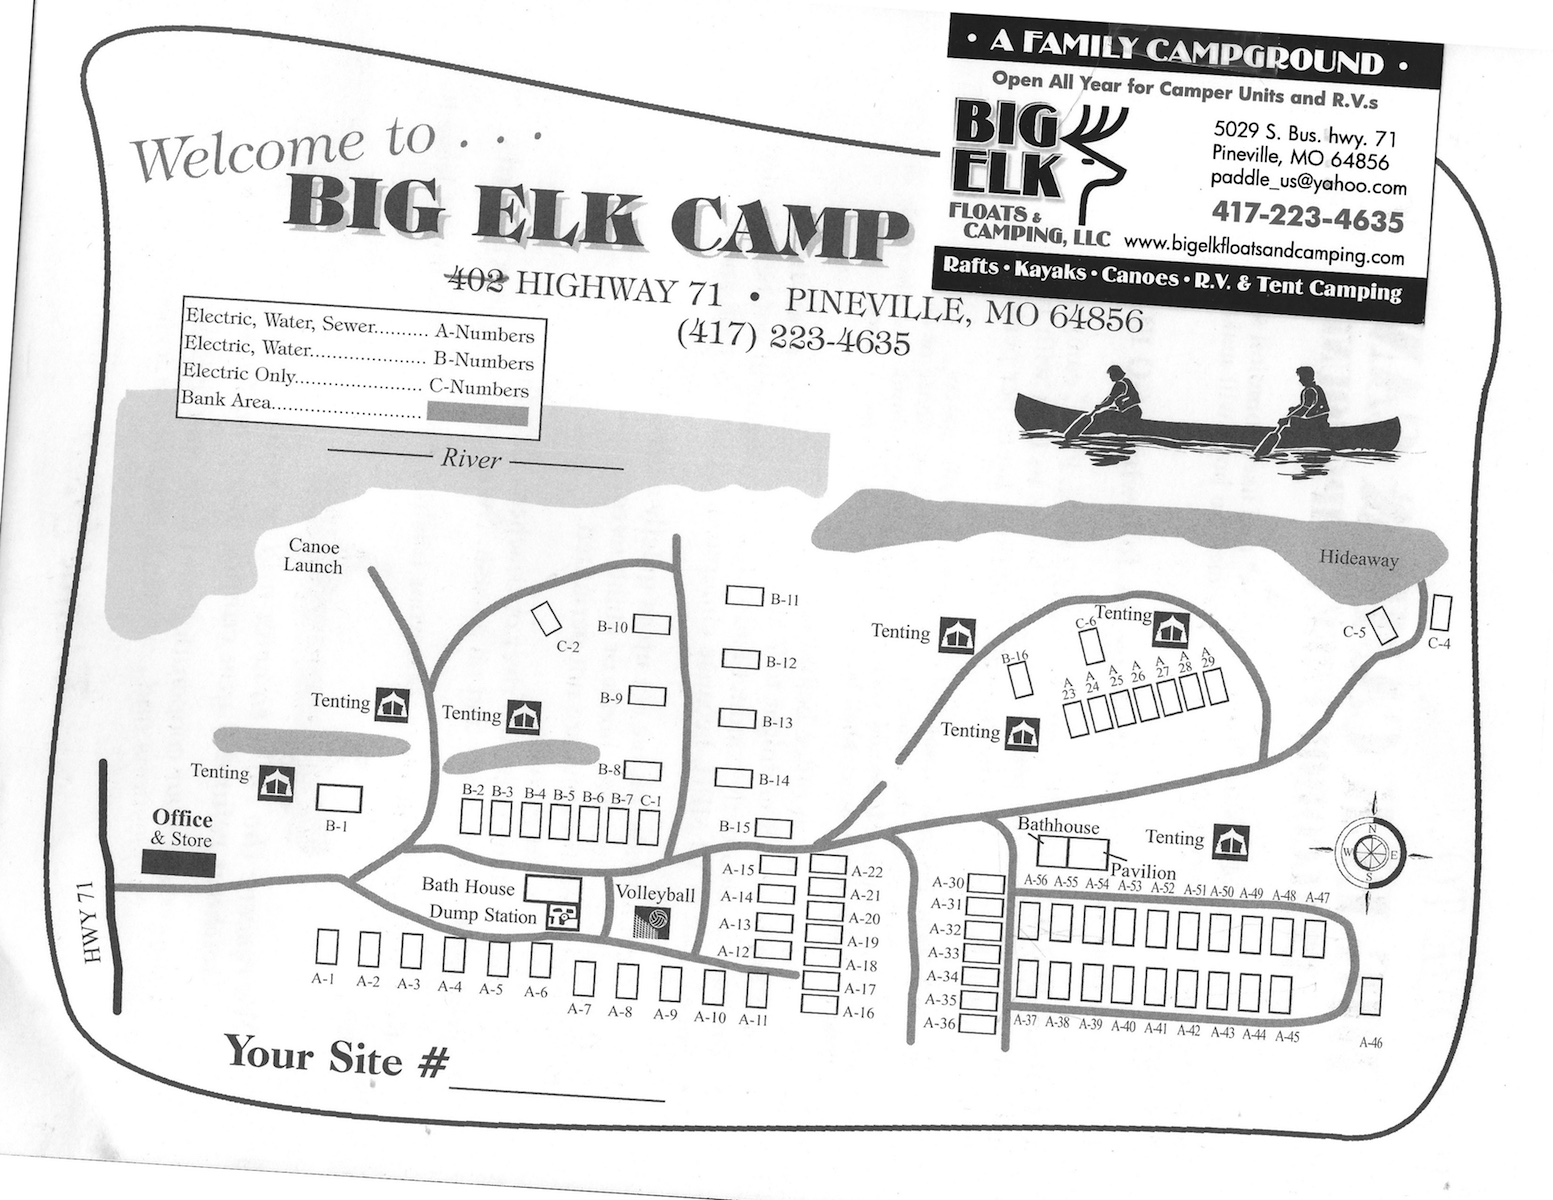 Click image for larger version  Name:Big Elk Map.jpg Views:128 Size:492.4 KB ID:297754